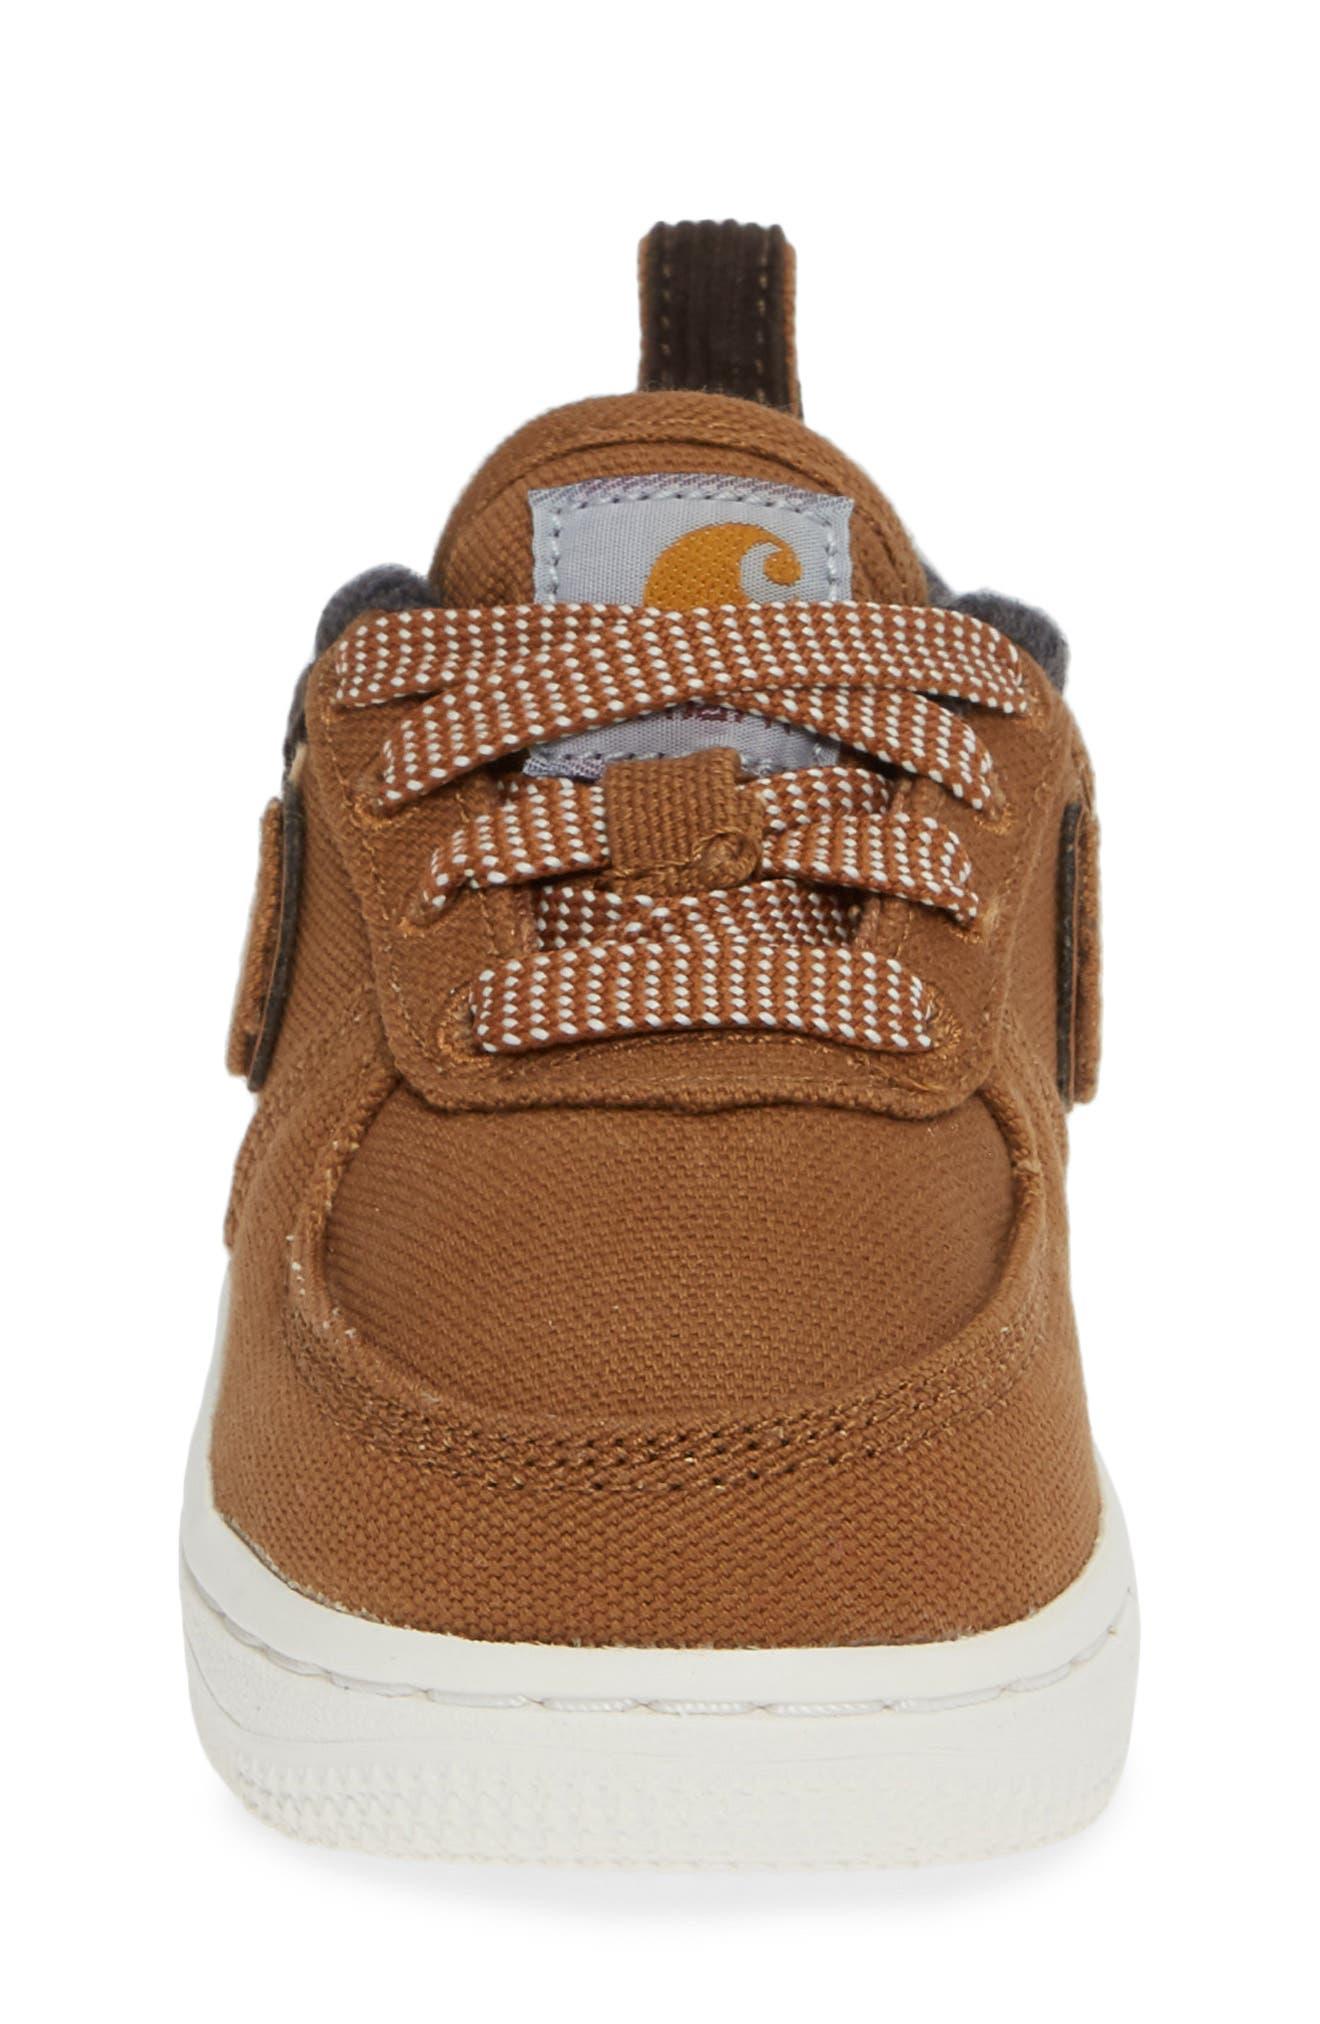 x Carhartt Air Force 1 Premium Sneaker,                             Alternate thumbnail 4, color,                             ALE BROWN/ ALE BROWN-SAIL